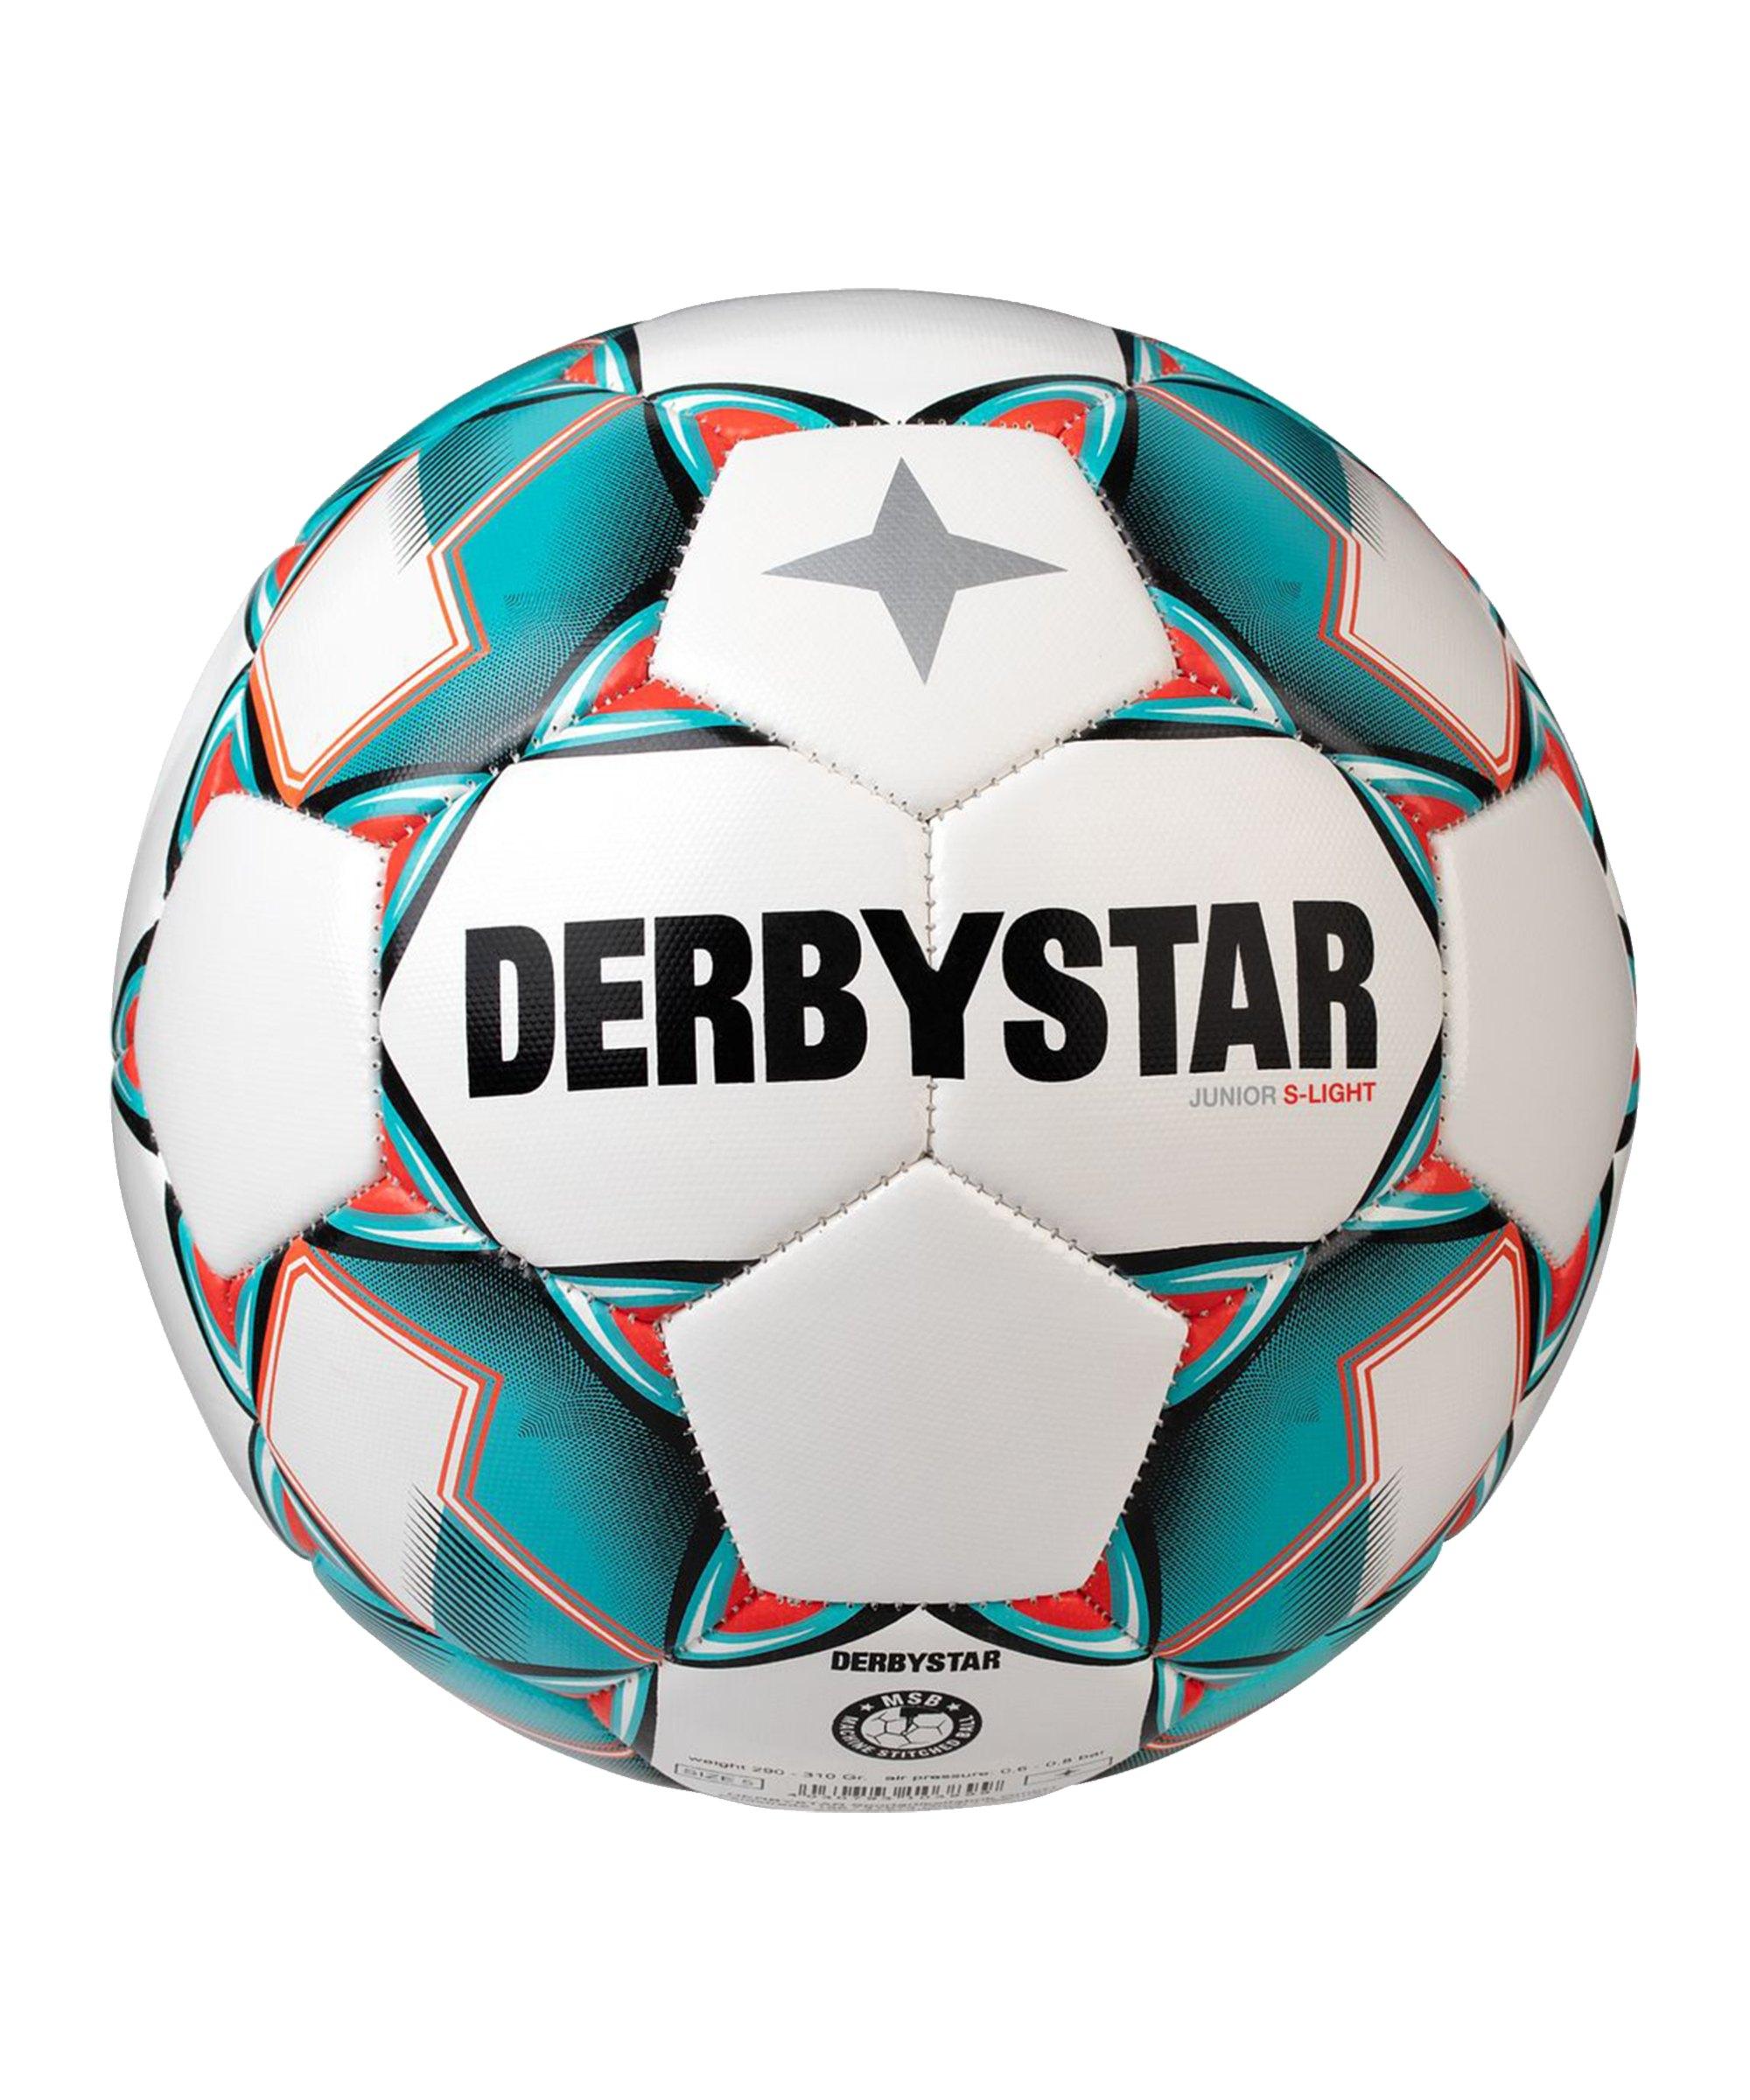 Derbystar S-Light v20 Light Fussball Weiss F142 - weiss